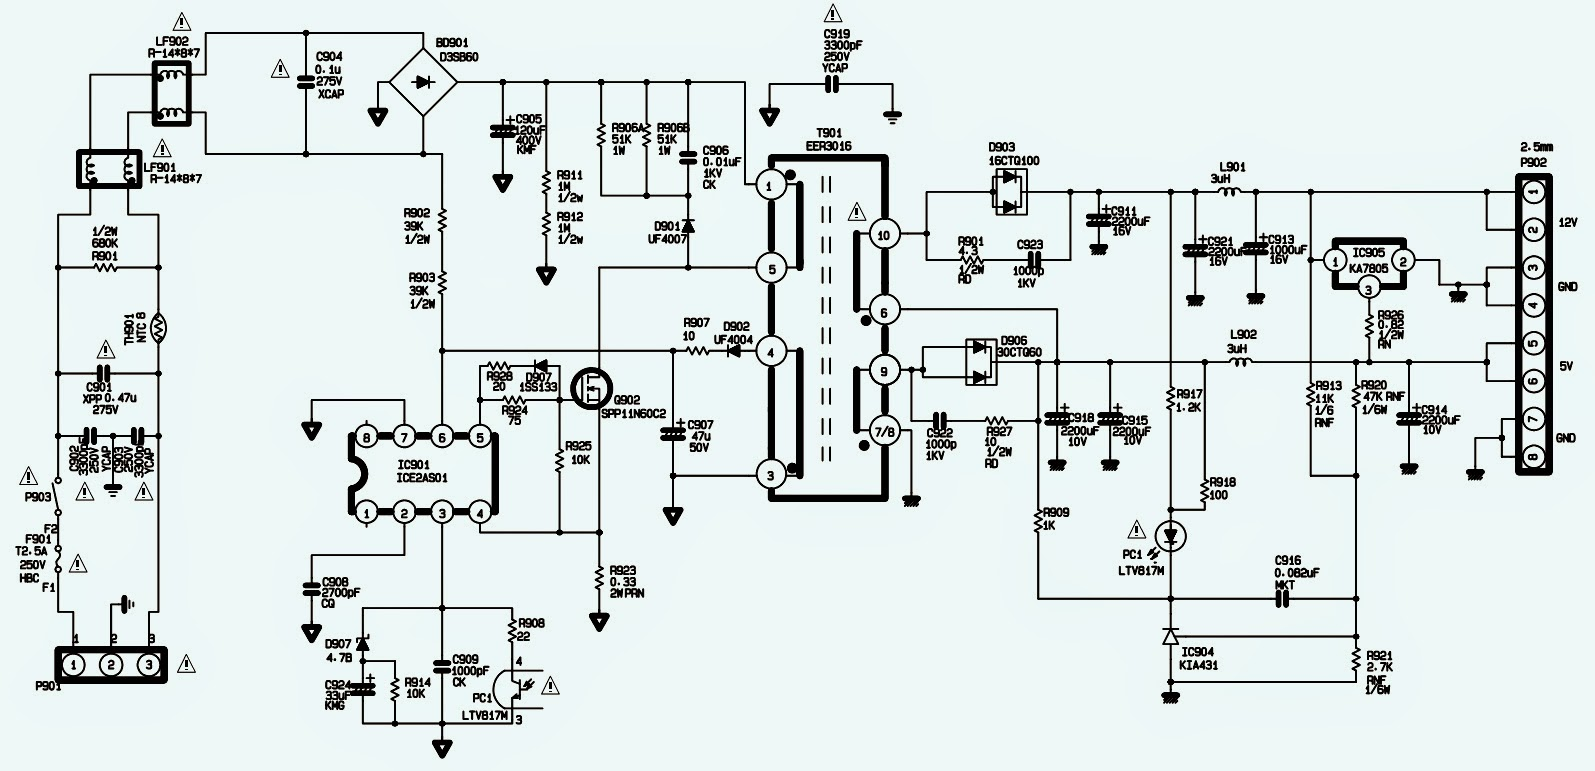 hight resolution of wiring schematic diagram lg flatron l1810b monitor smps schematic power supply wiring diagram schematic